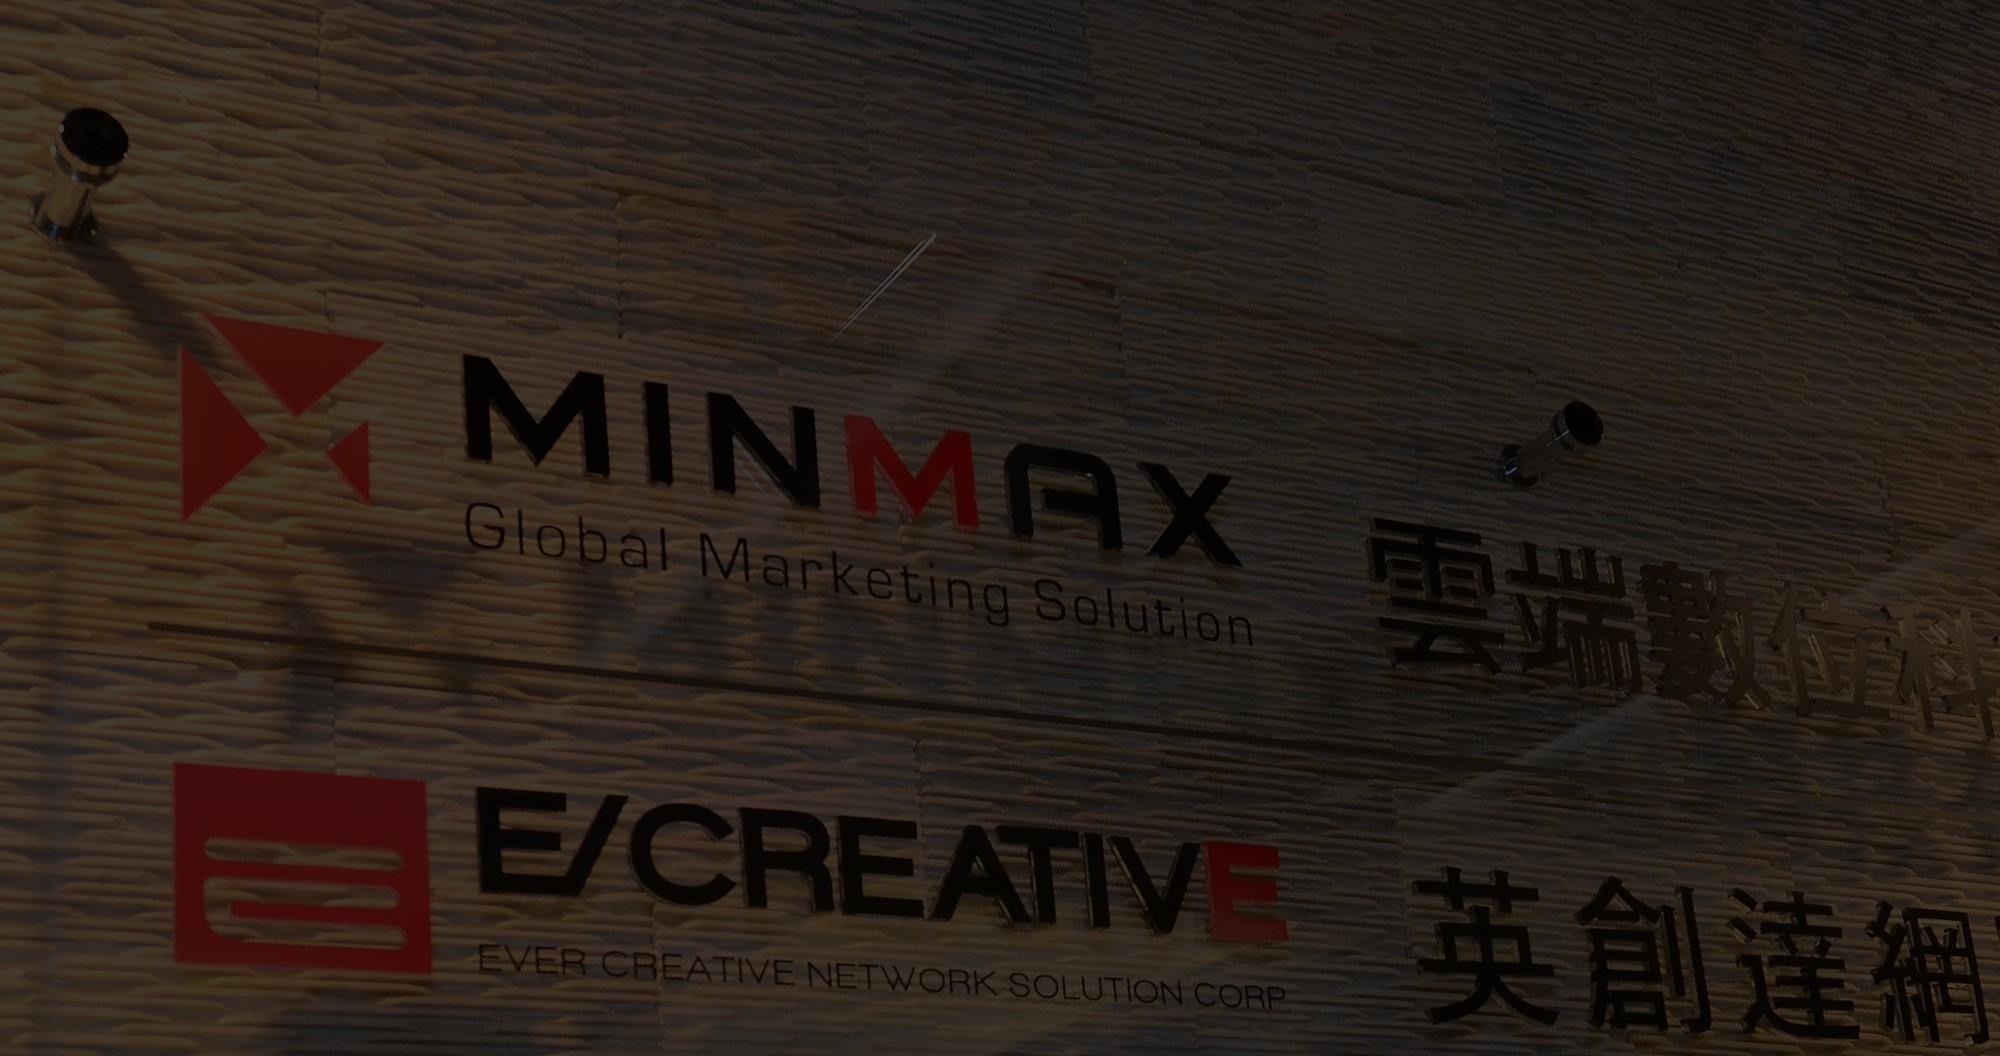 Why MINMAX?